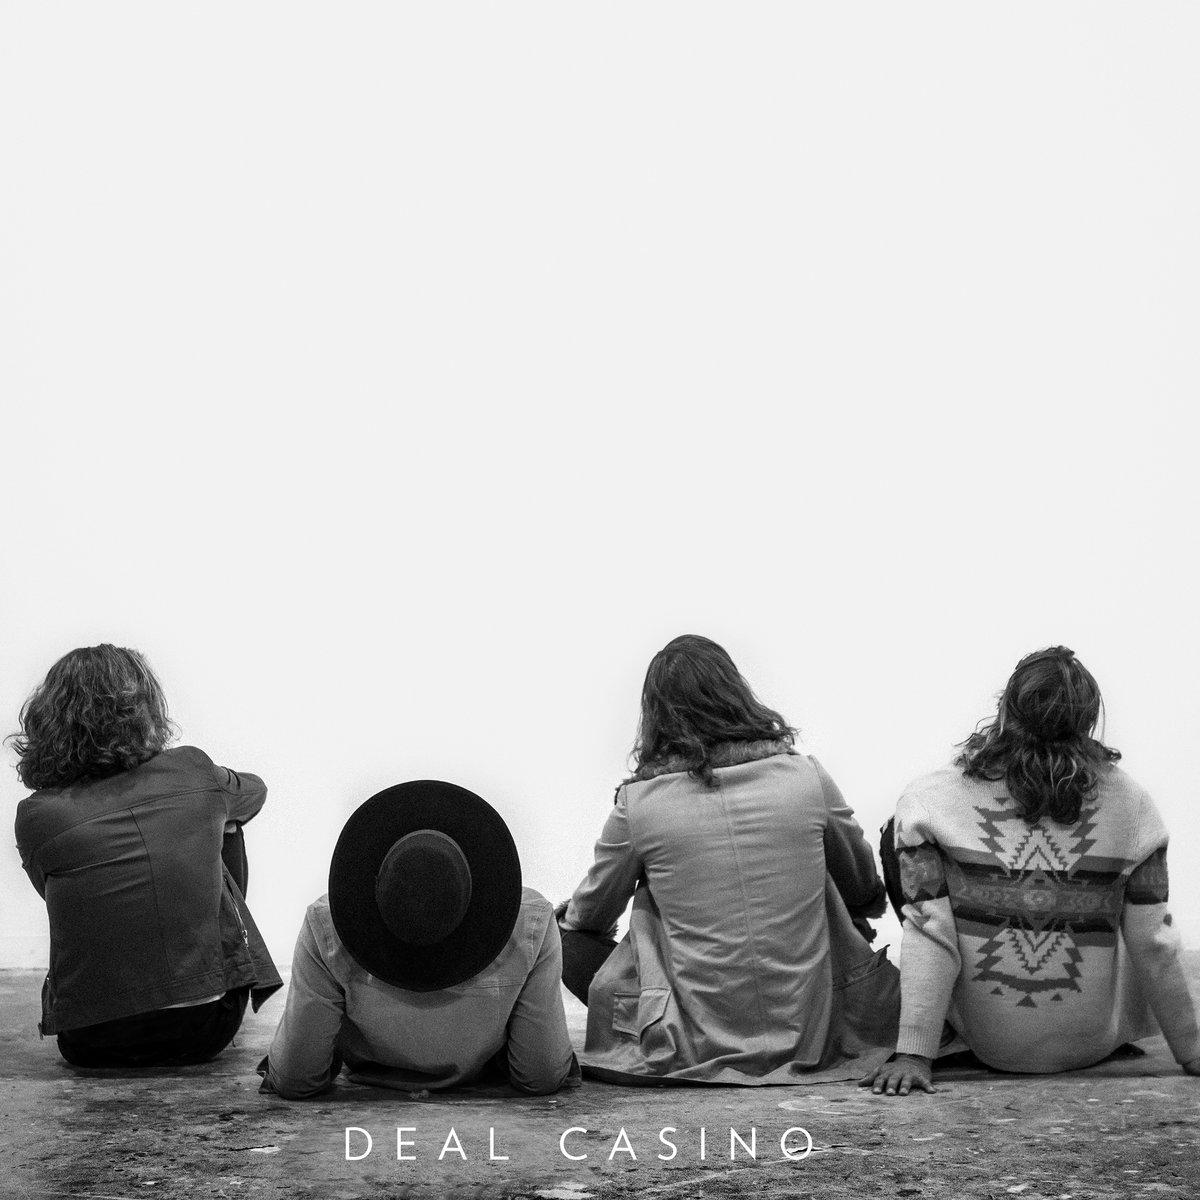 10/10 Deal Casino